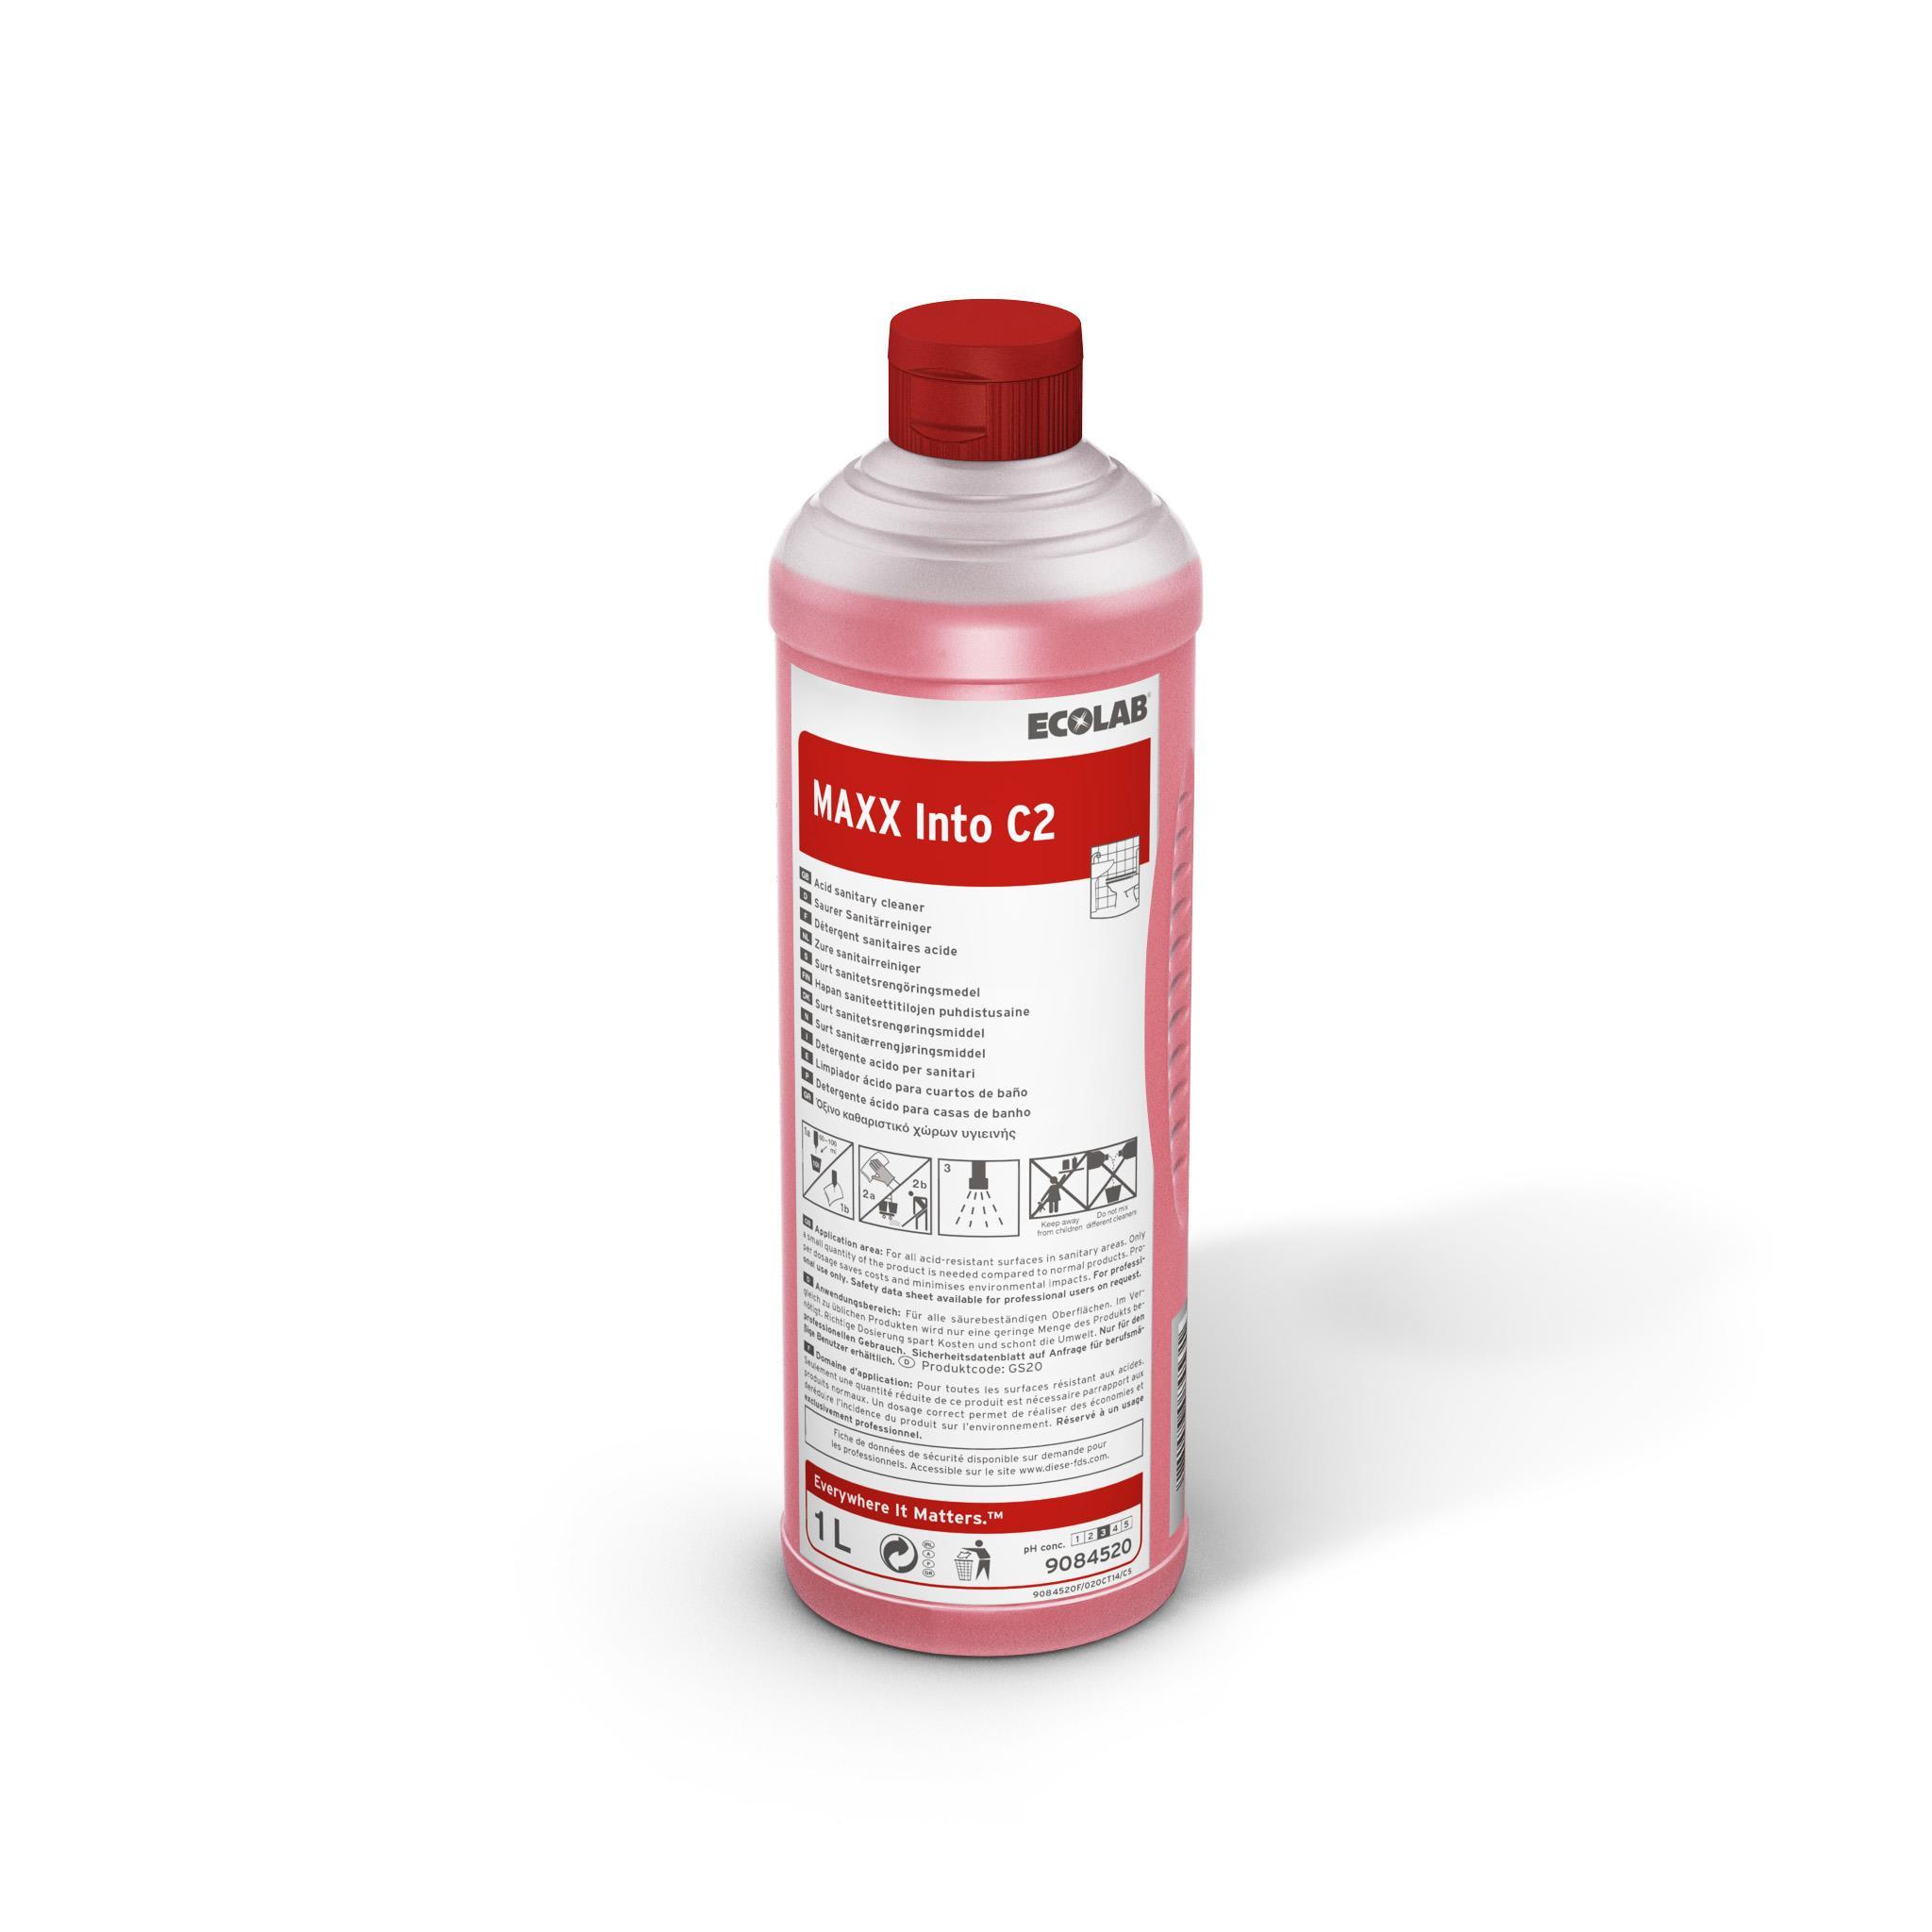 Detergent Sanitar Pentru Curatarea Zilnica Maxx2 Into C 1l Ecolab - Ecologic sanito.ro